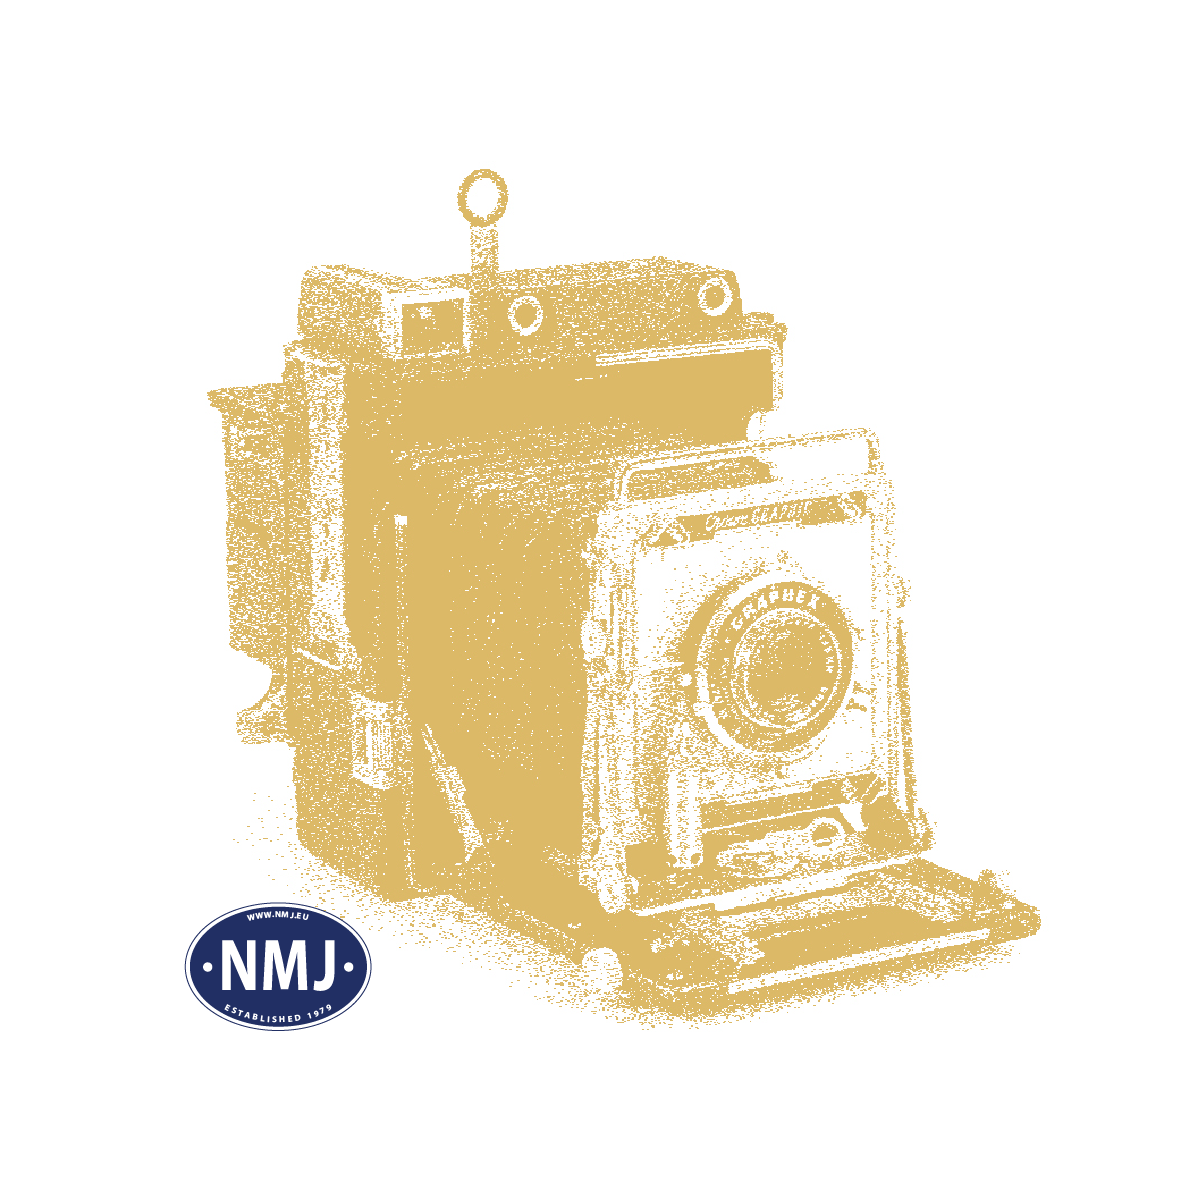 "NOC56006 - Takplate ""Holzschindel"", Laser-Cut"